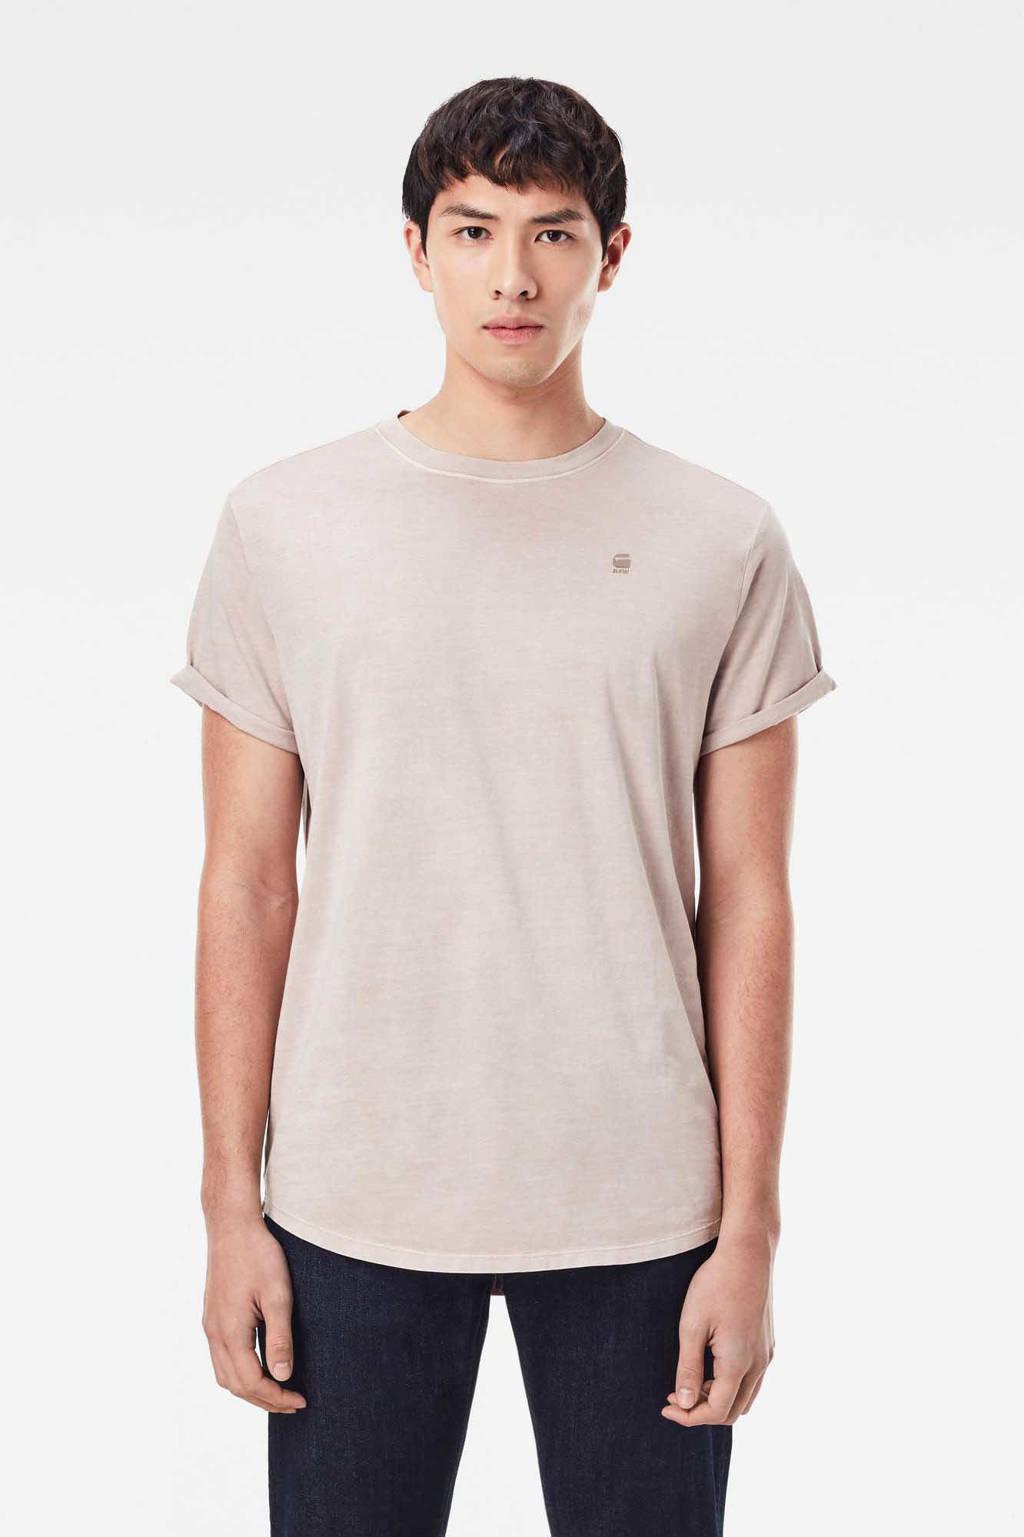 G-Star RAW T-shirt van biologisch katoen lichtroze, Lichtroze